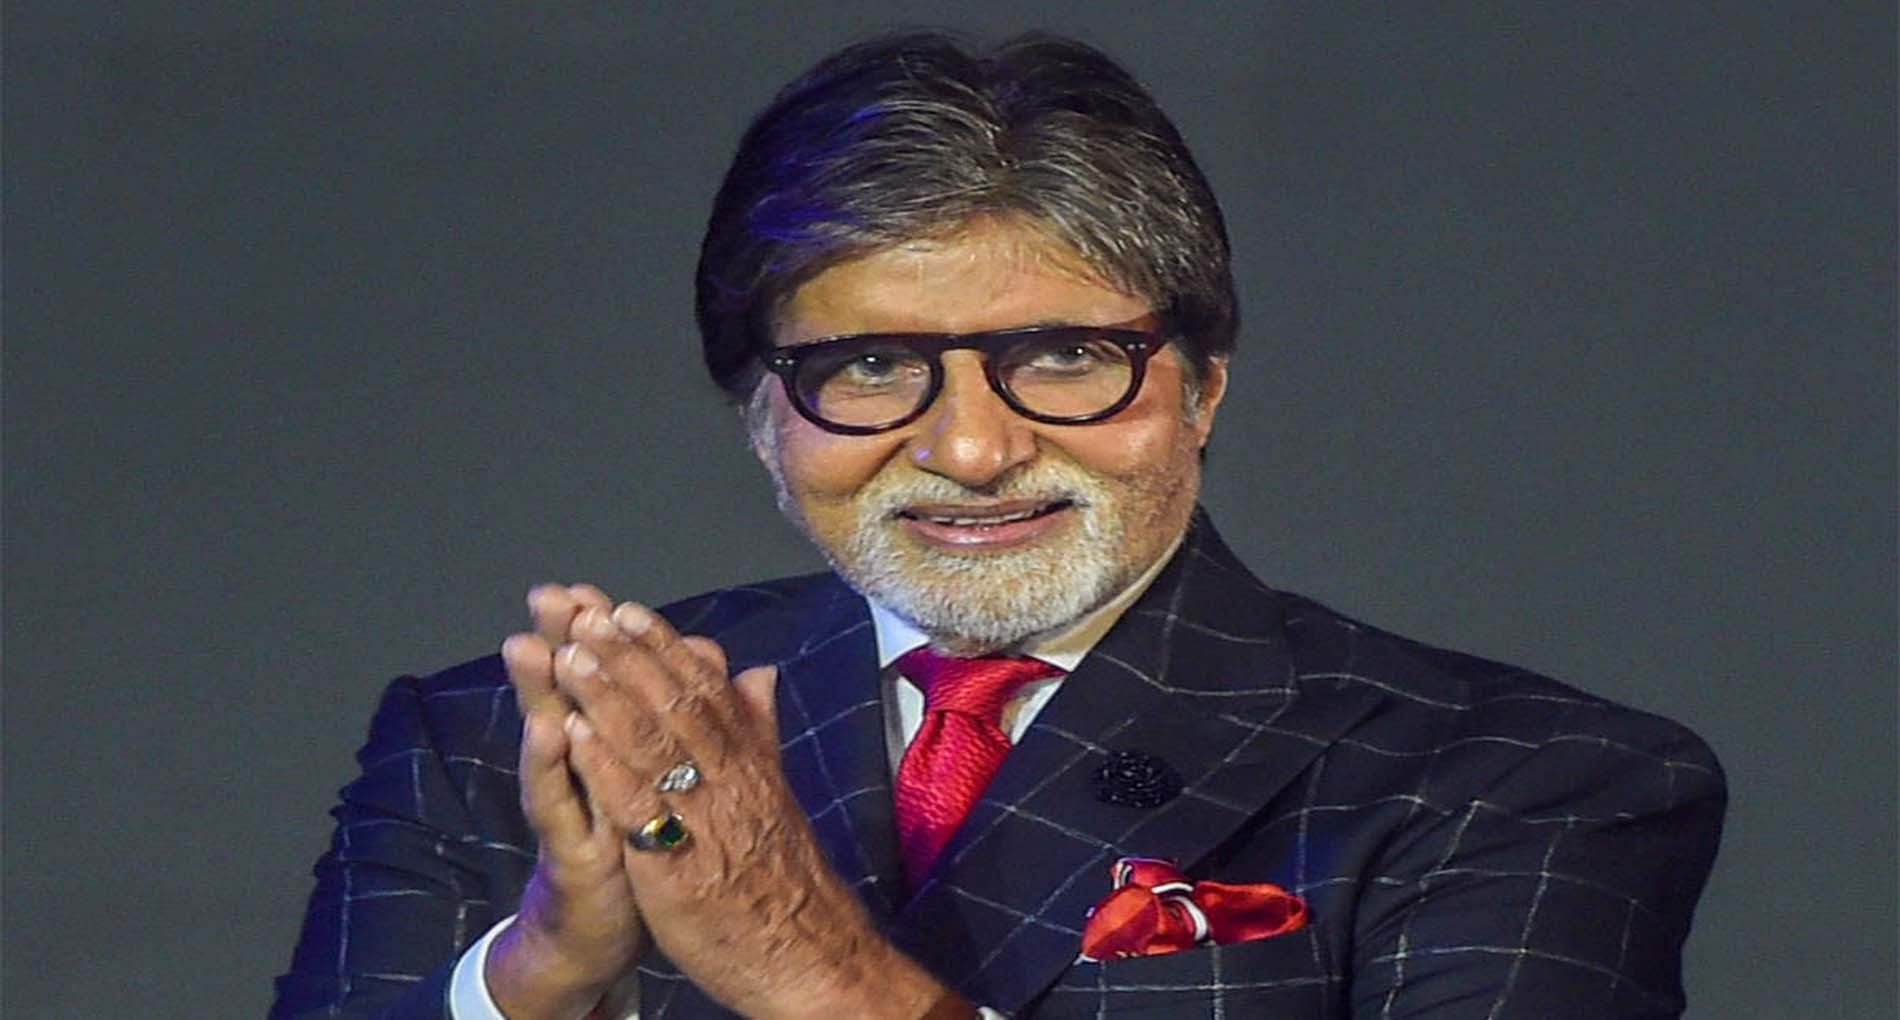 अमिताब बच्चन ने मांगी Job तो फैन ने दिया जॉब ऑफर, कहा- 'अब मेरी जॉब पक्की'